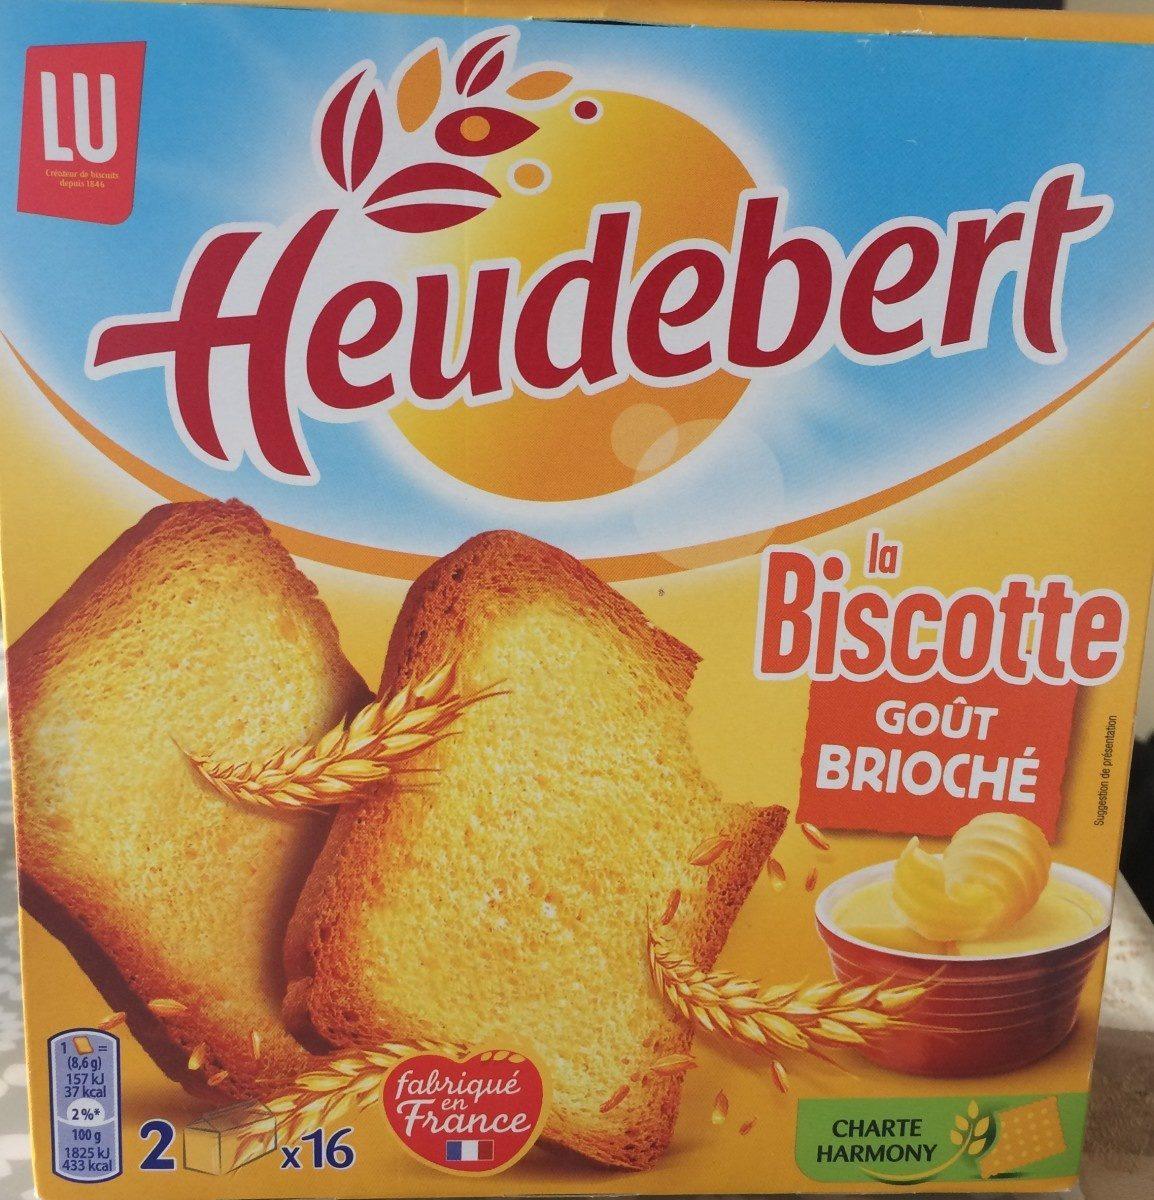 Heudebert La Biscotte Goût Brioché - Product - fr